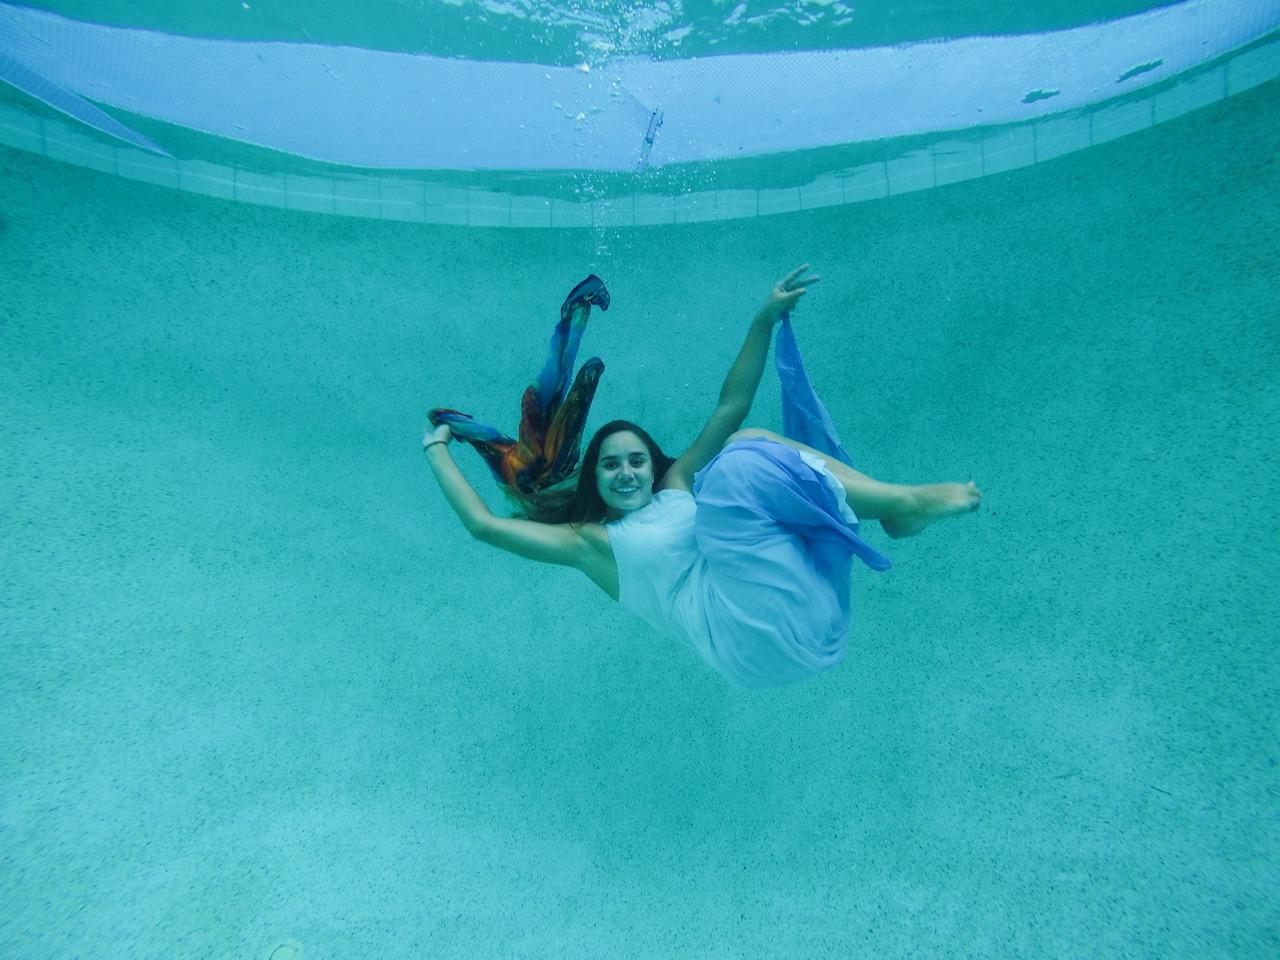 30 birthday mermaid pool photos